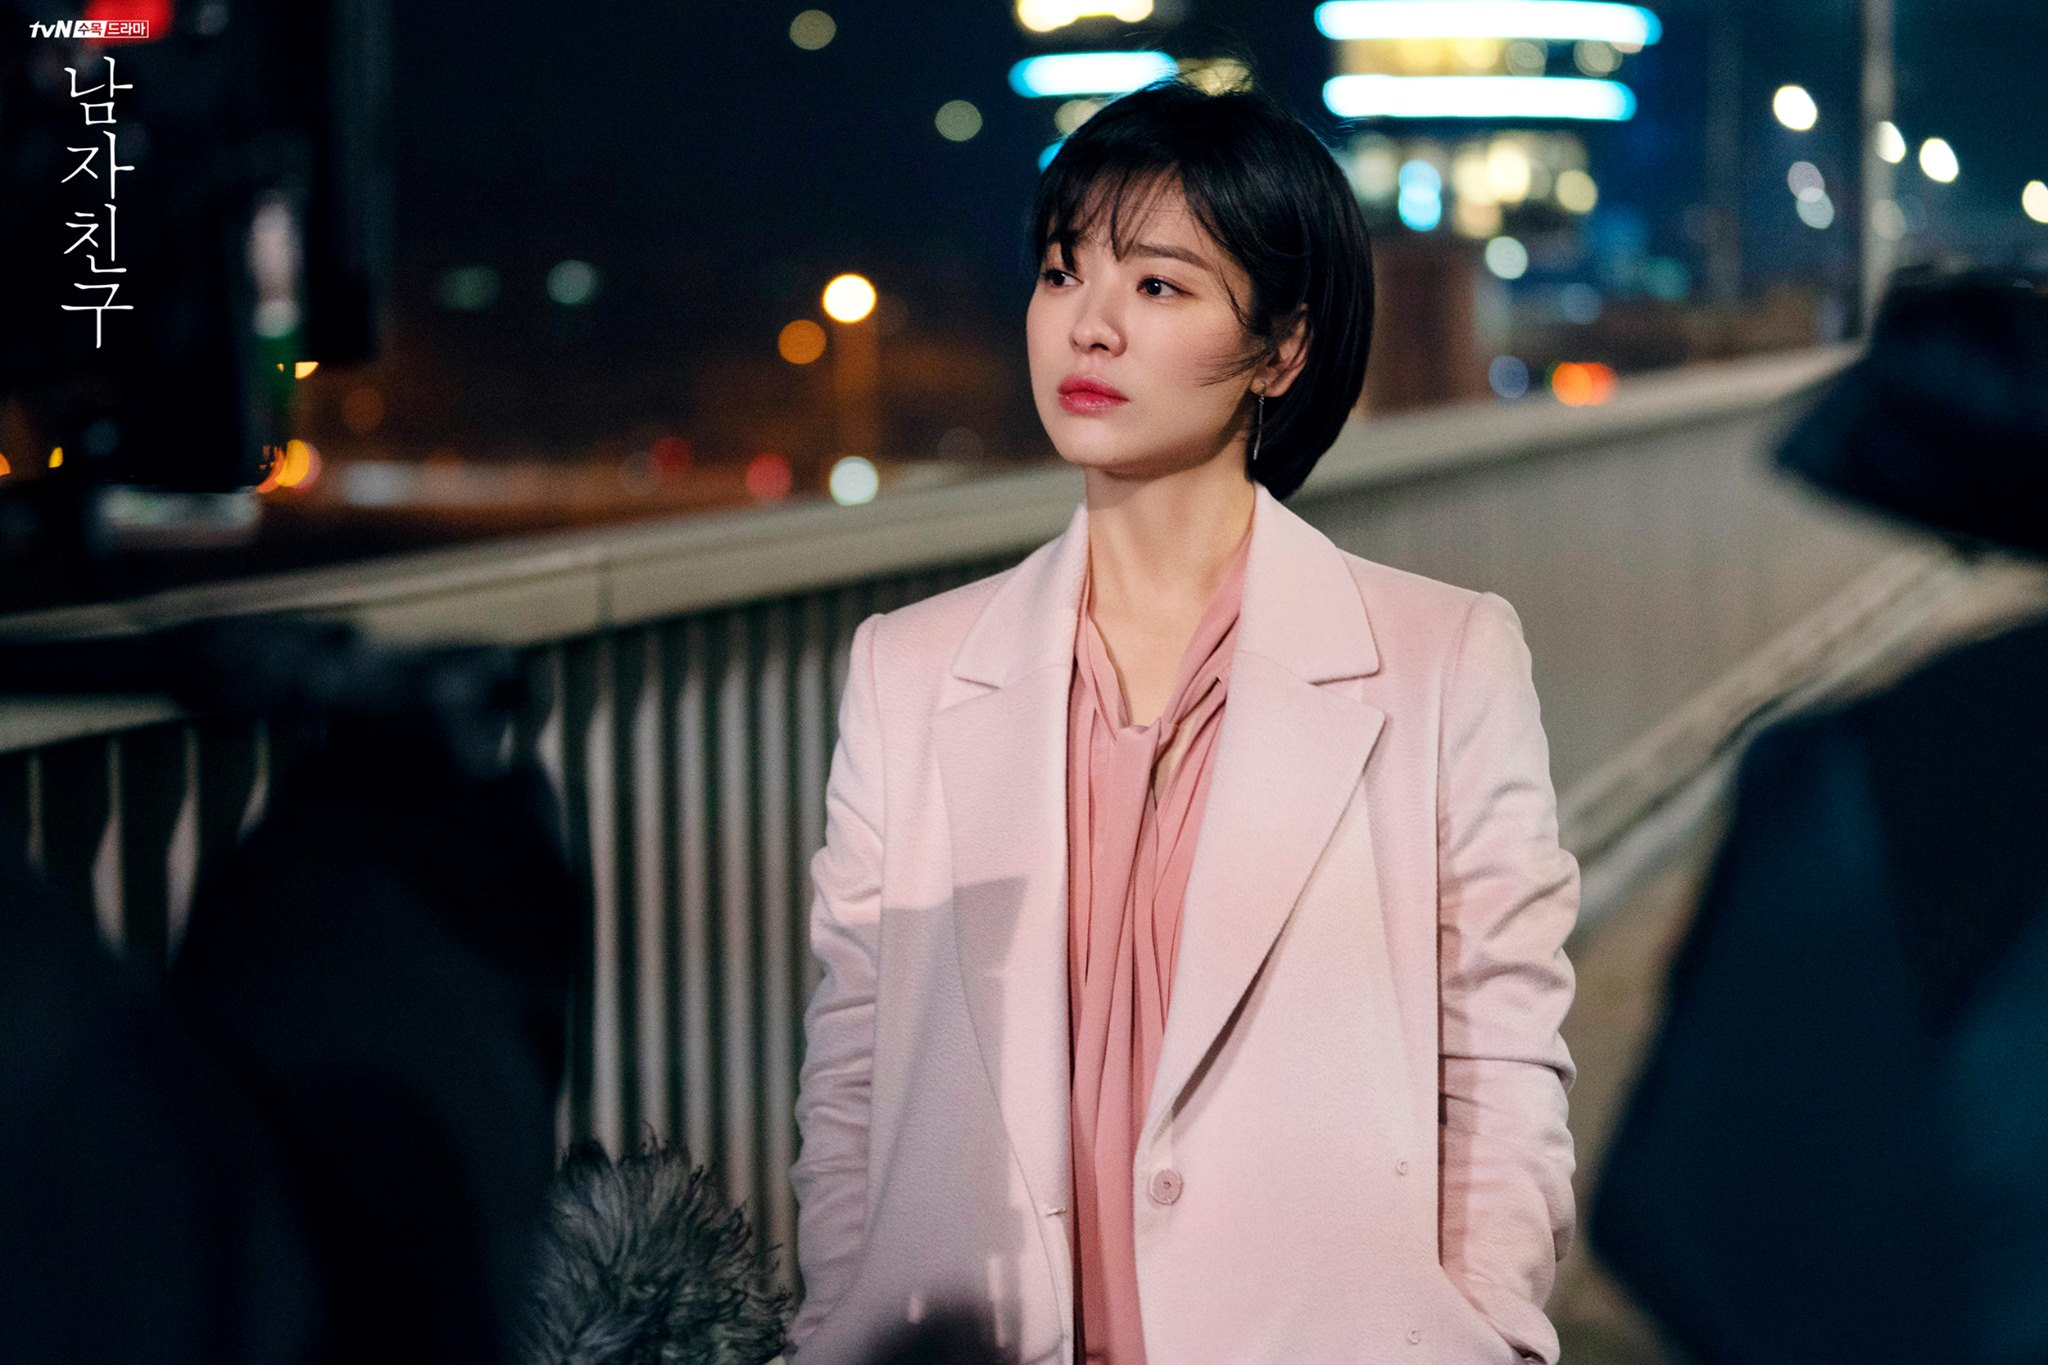 korean drama divorcee, tvn drama